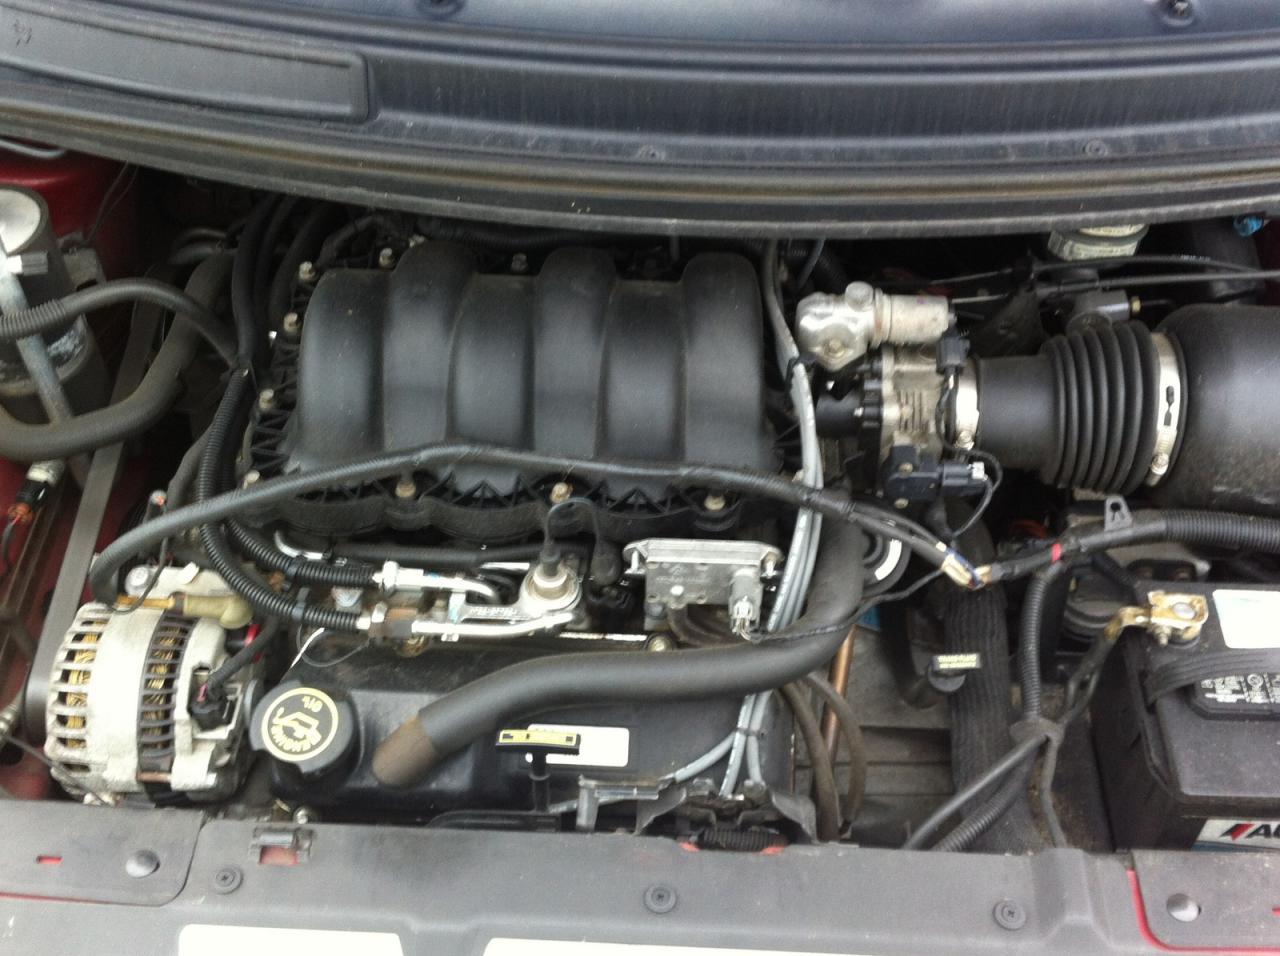 800 1024 1280 1600 origin 1999 Ford Windstar ...